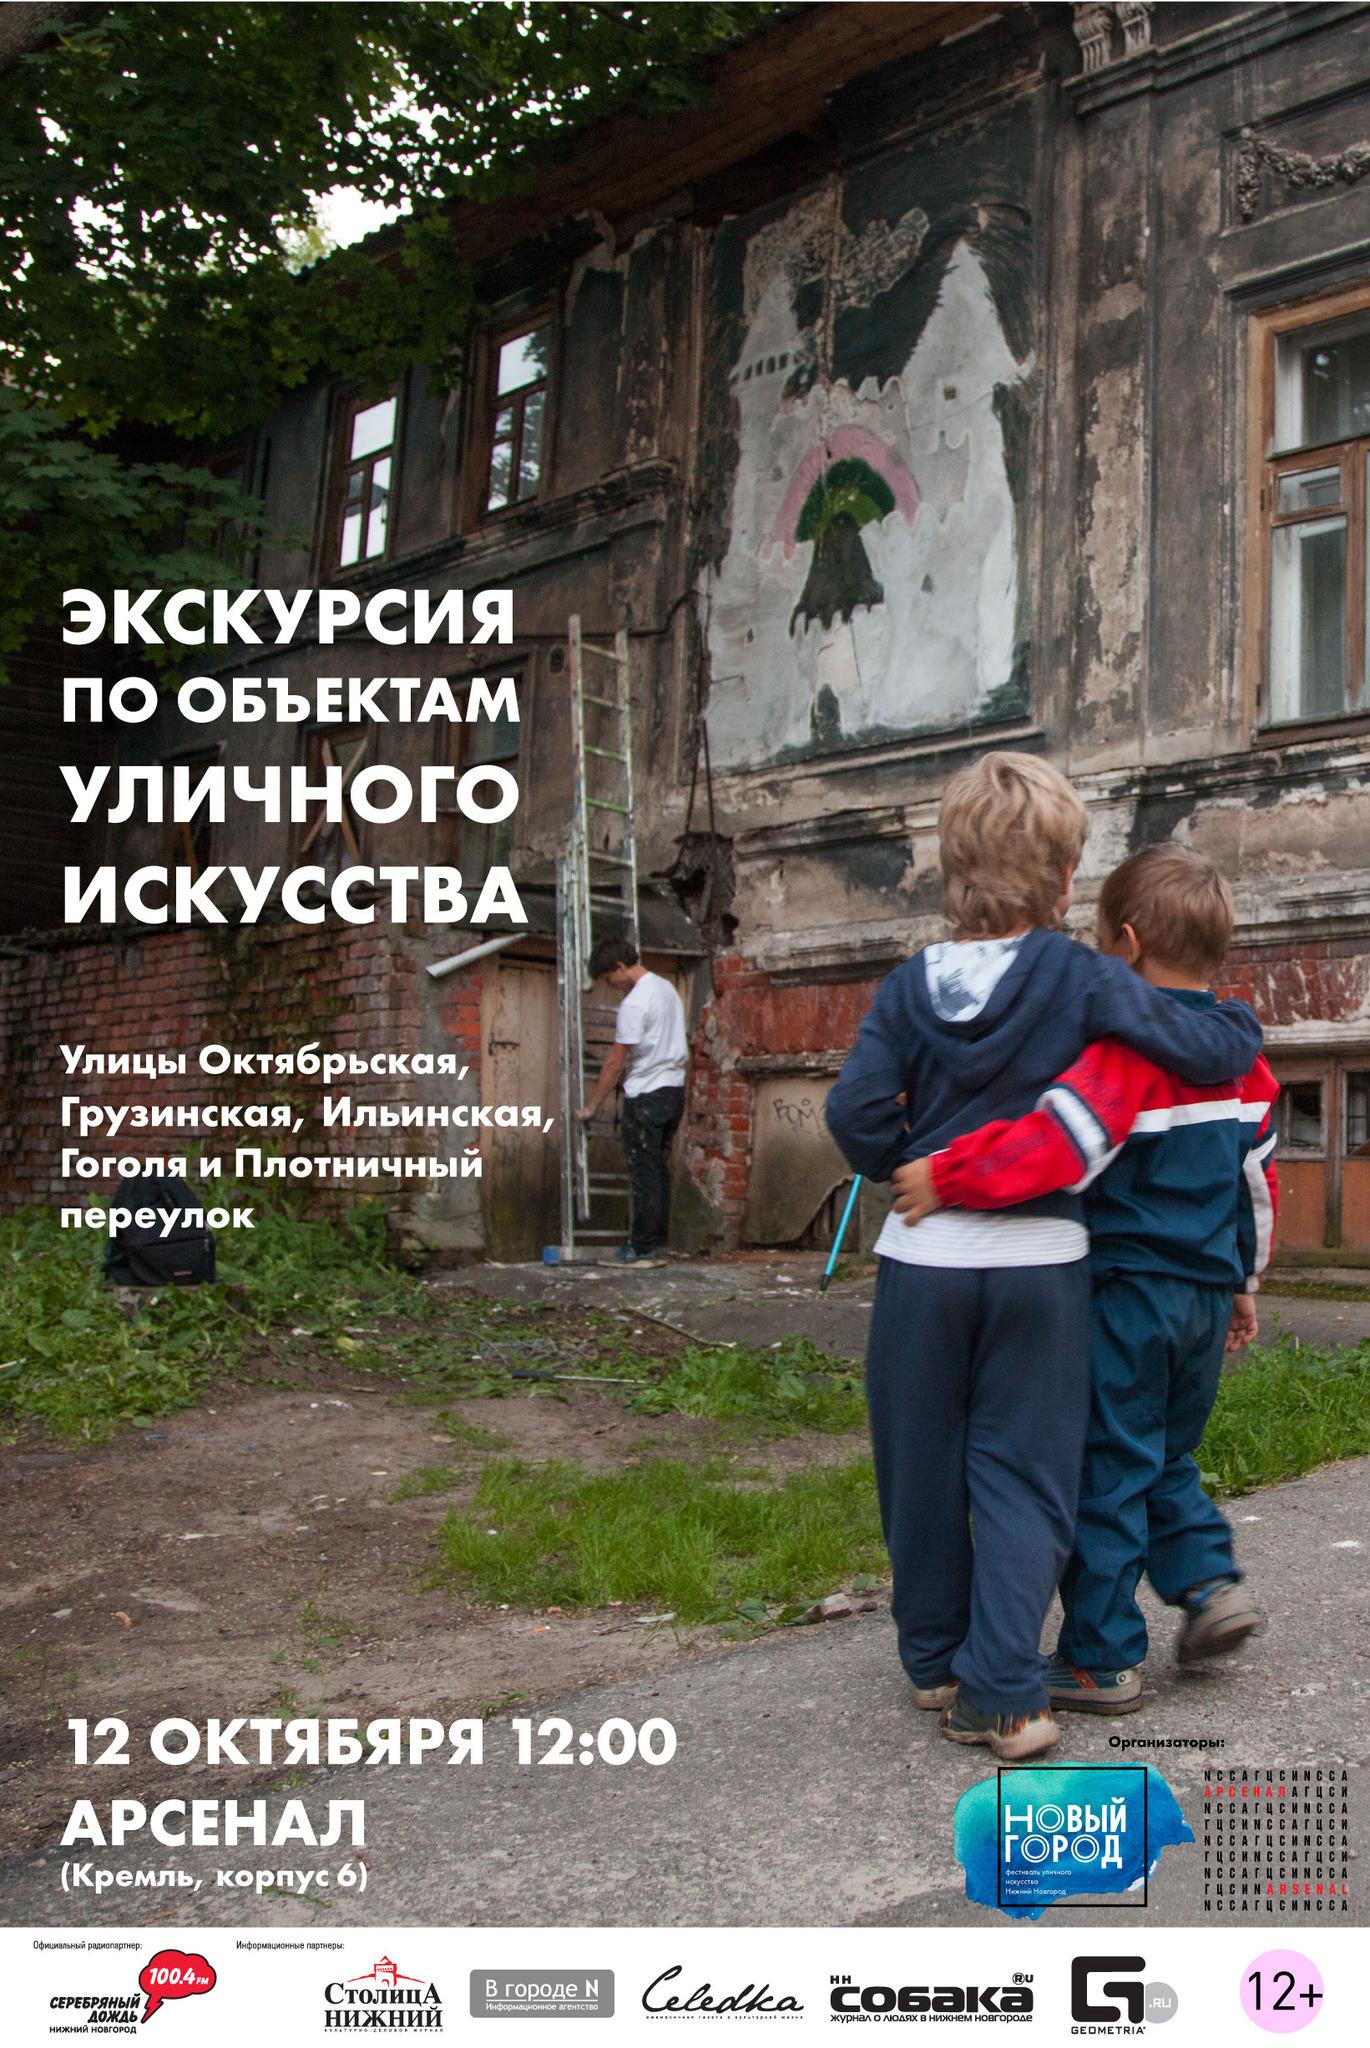 Tour of the street art with Artem Filatov